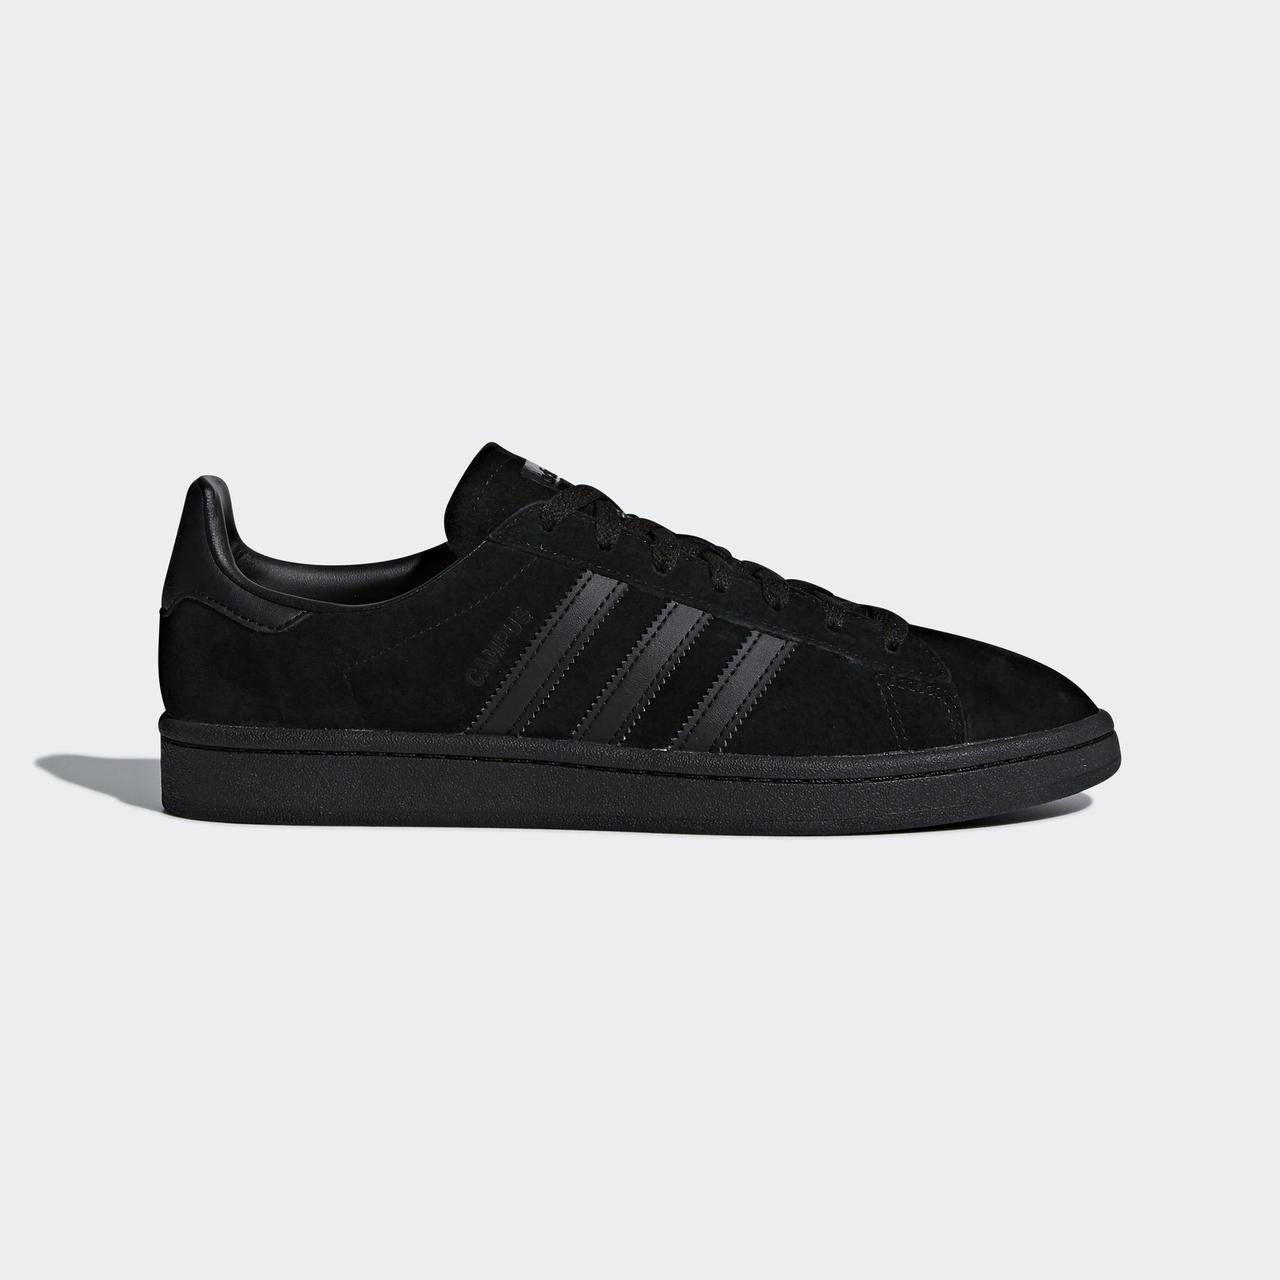 fbf6f36104bc55 Мужские кроссовки Adidas Originals Campus (Артикул: CQ2071) -  Интернет-магазин «Эксперт